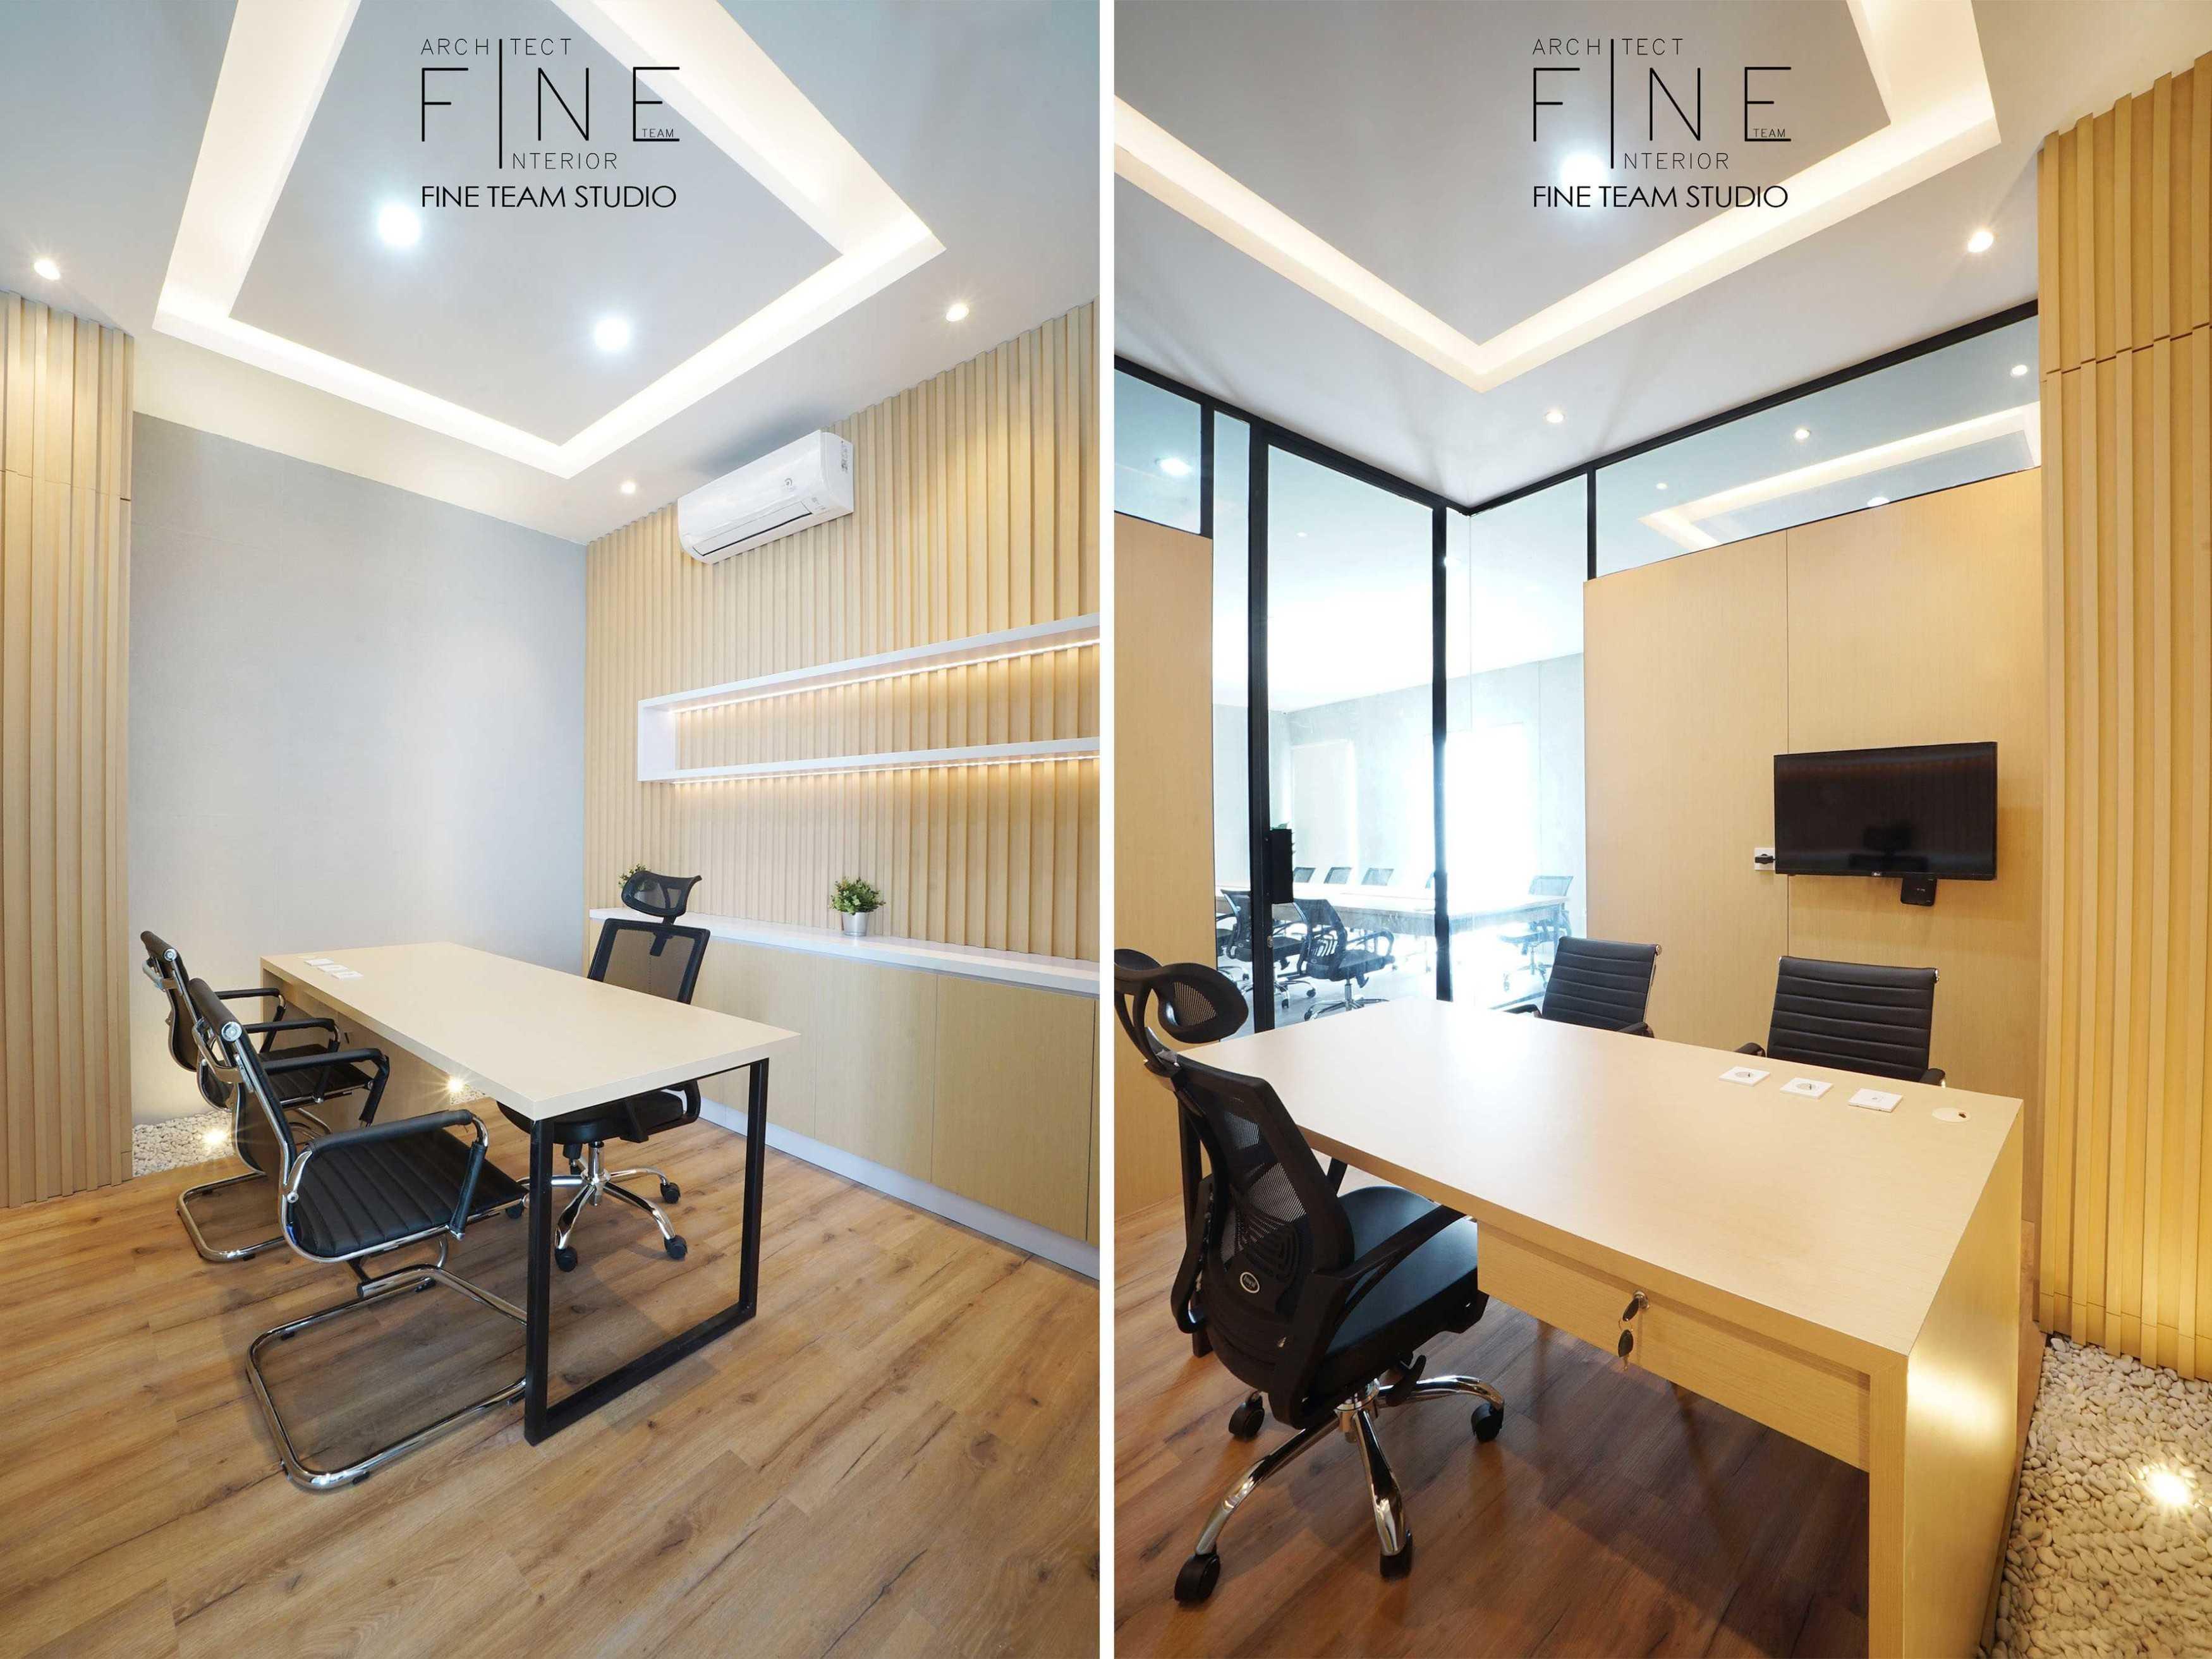 Fine Team Studio Mob Office Cikupa, Tangerang, Banten, Indonesia Cikupa, Tangerang, Banten, Indonesia Fine-Team-Studio-Mob-Office   71131